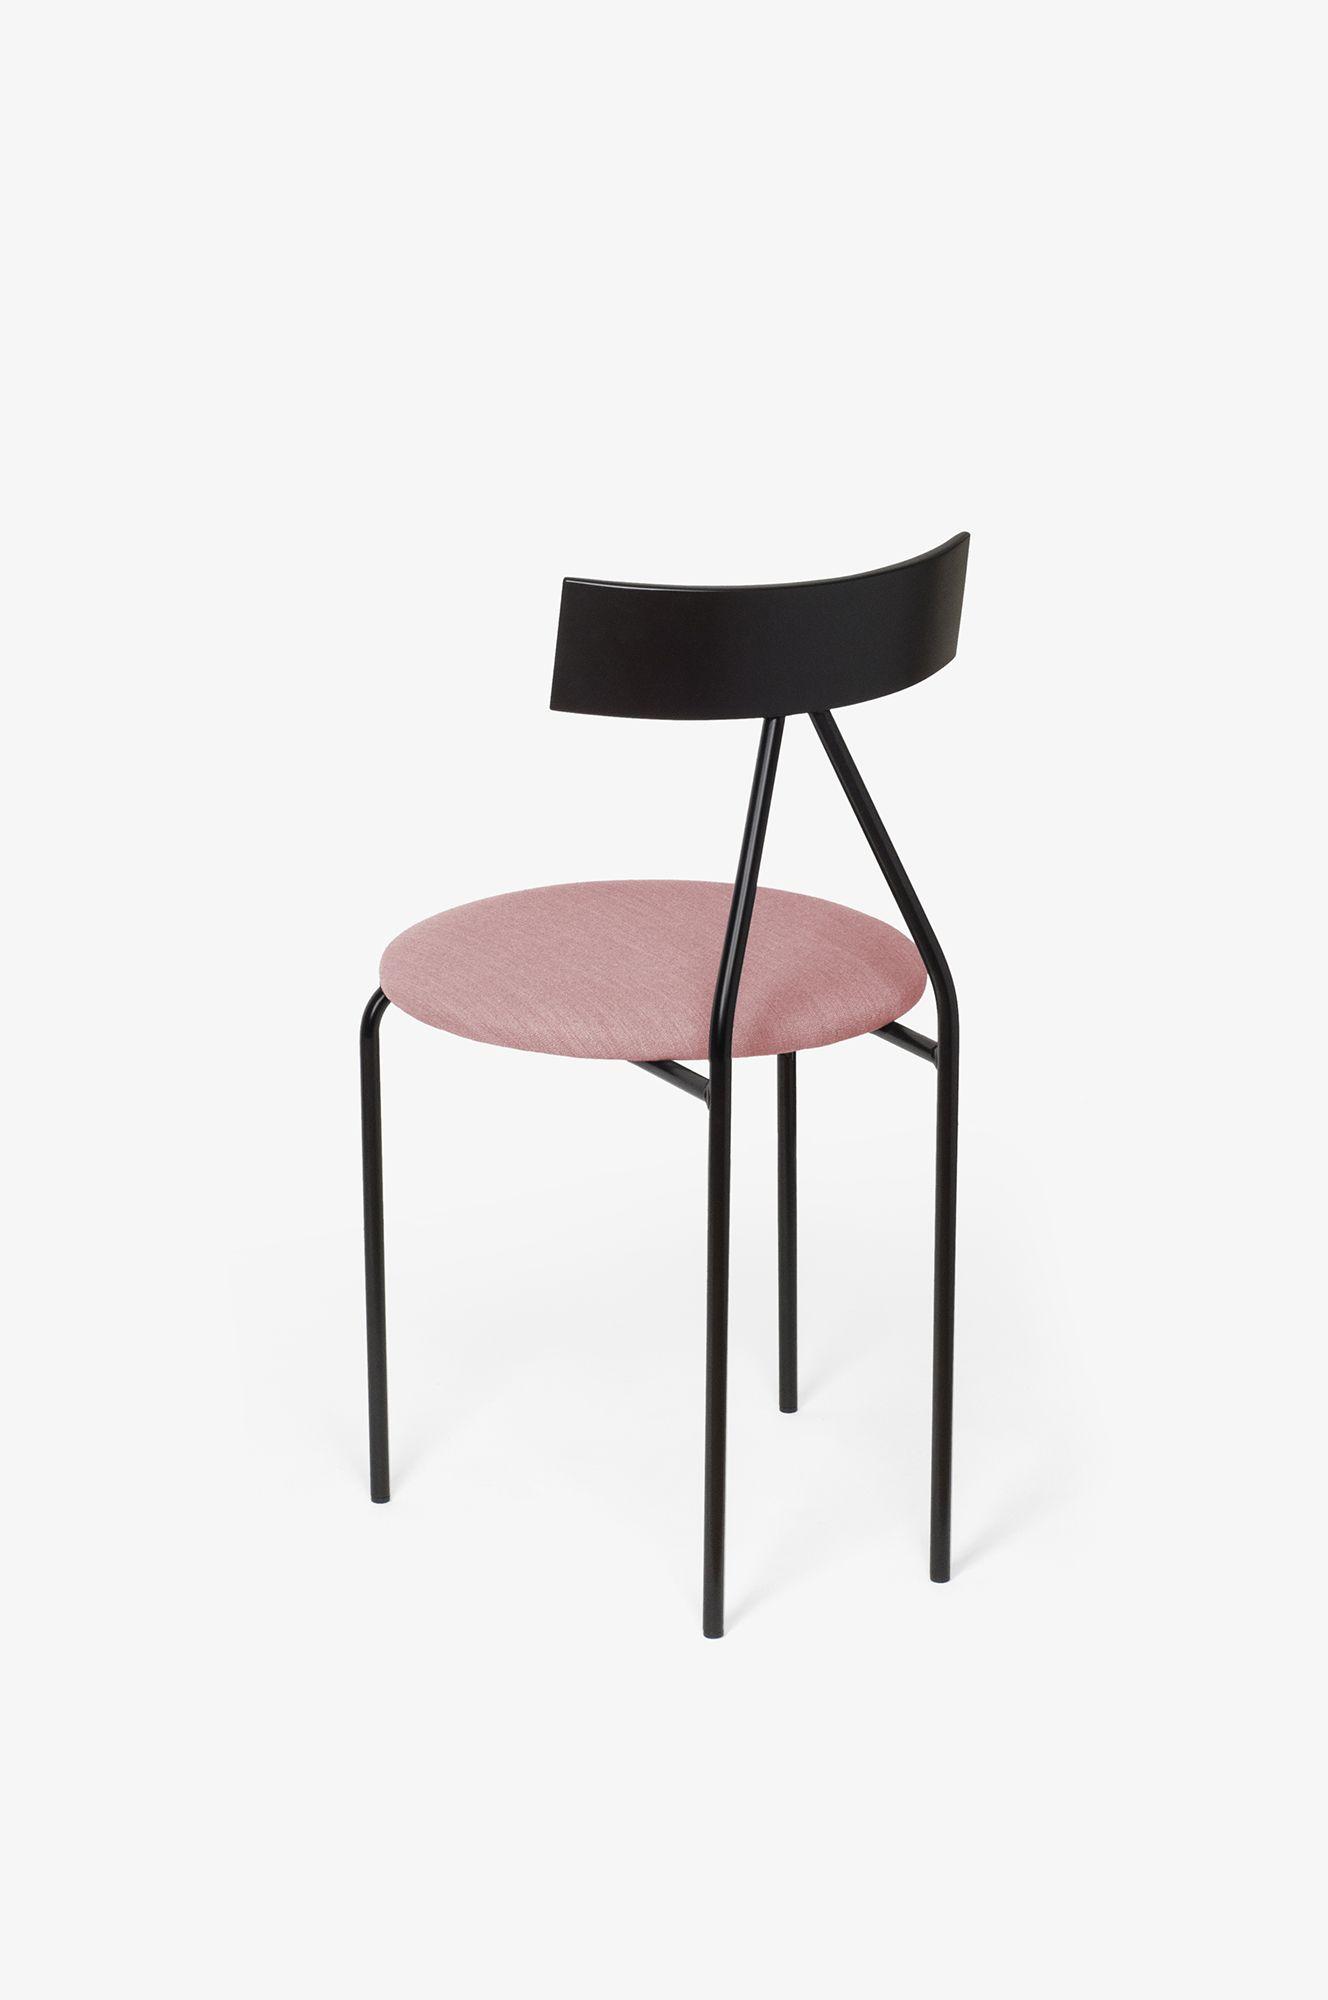 gofi chair is a minimalist chair designed by barcelona based studio goula figuera studio minimalist furniture dining chairs diy minimalist chair